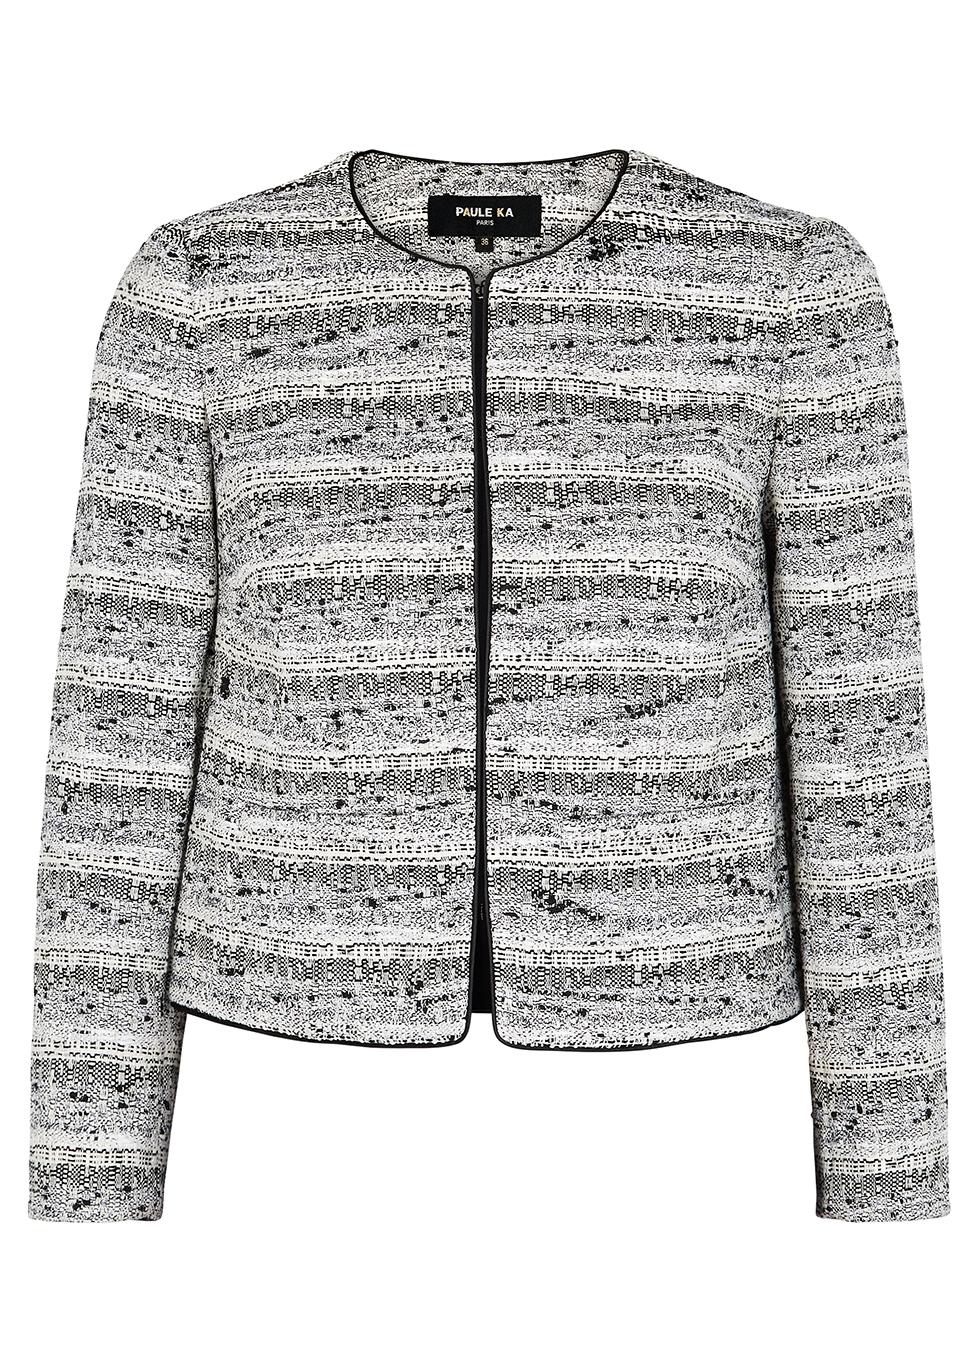 Monochrome bouclé tweed jacket